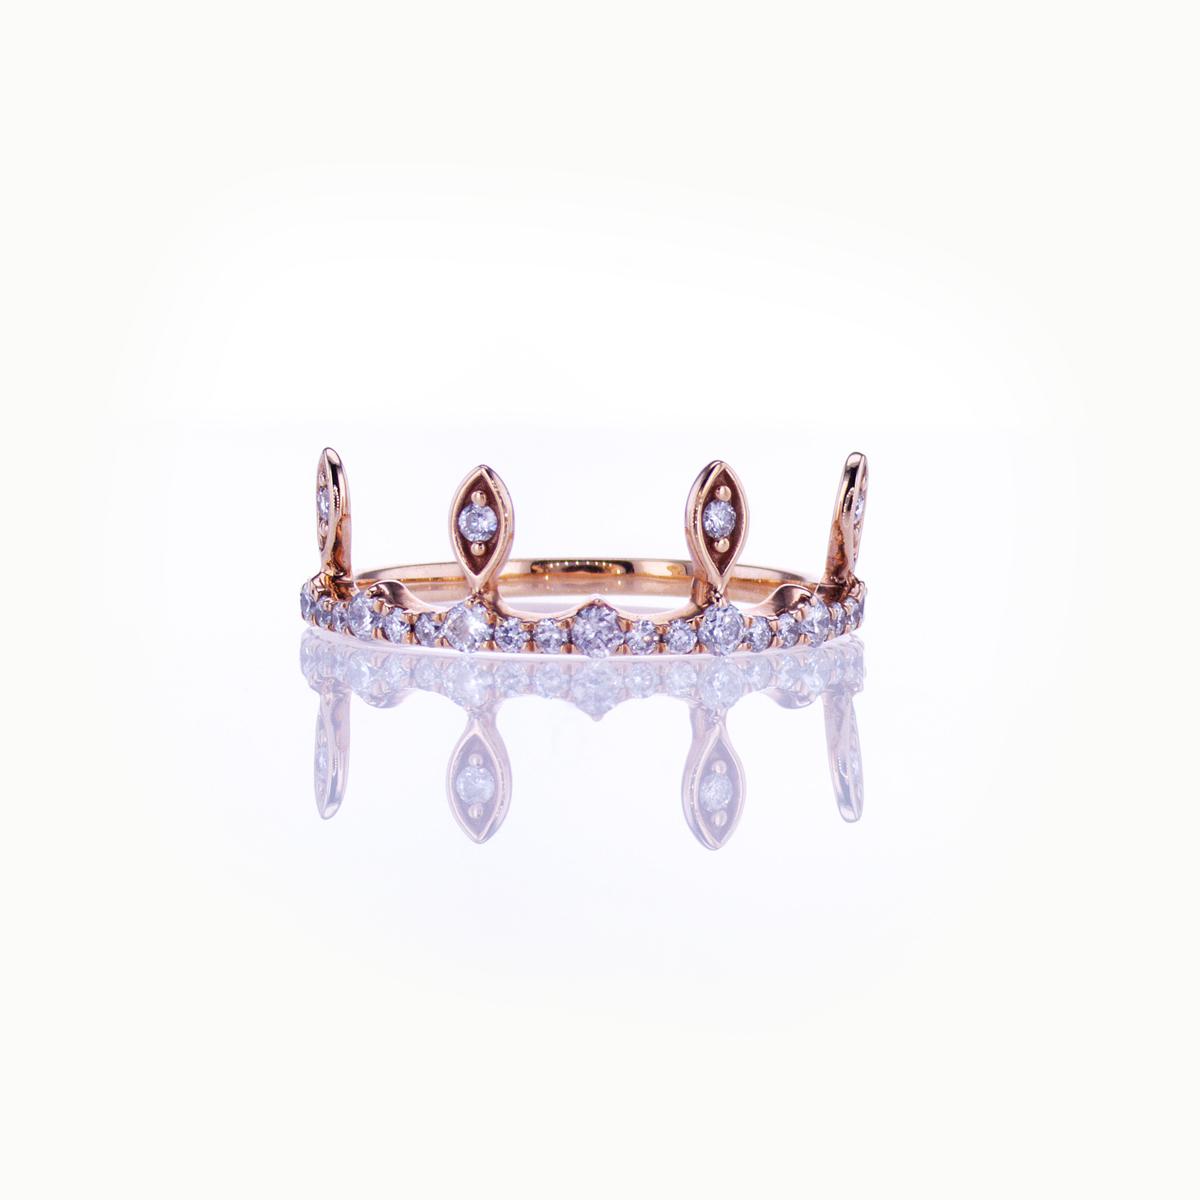 Diamond Crowne Band